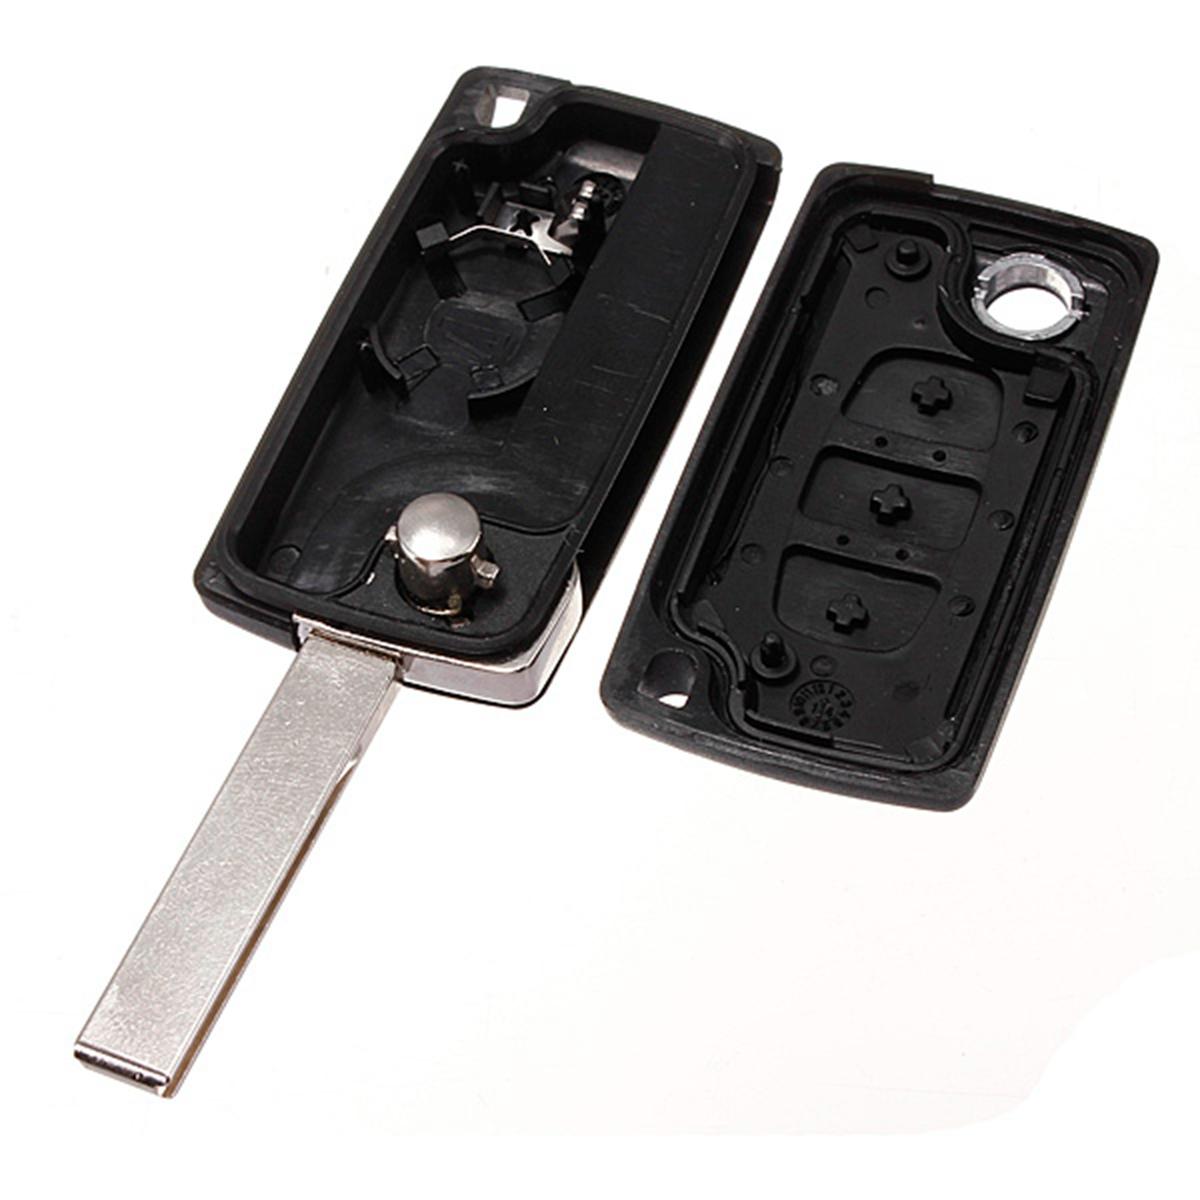 3 button flip cover remote key case fob for citroen c2 c3 c4 c5 c6 xsara picasso ebay. Black Bedroom Furniture Sets. Home Design Ideas